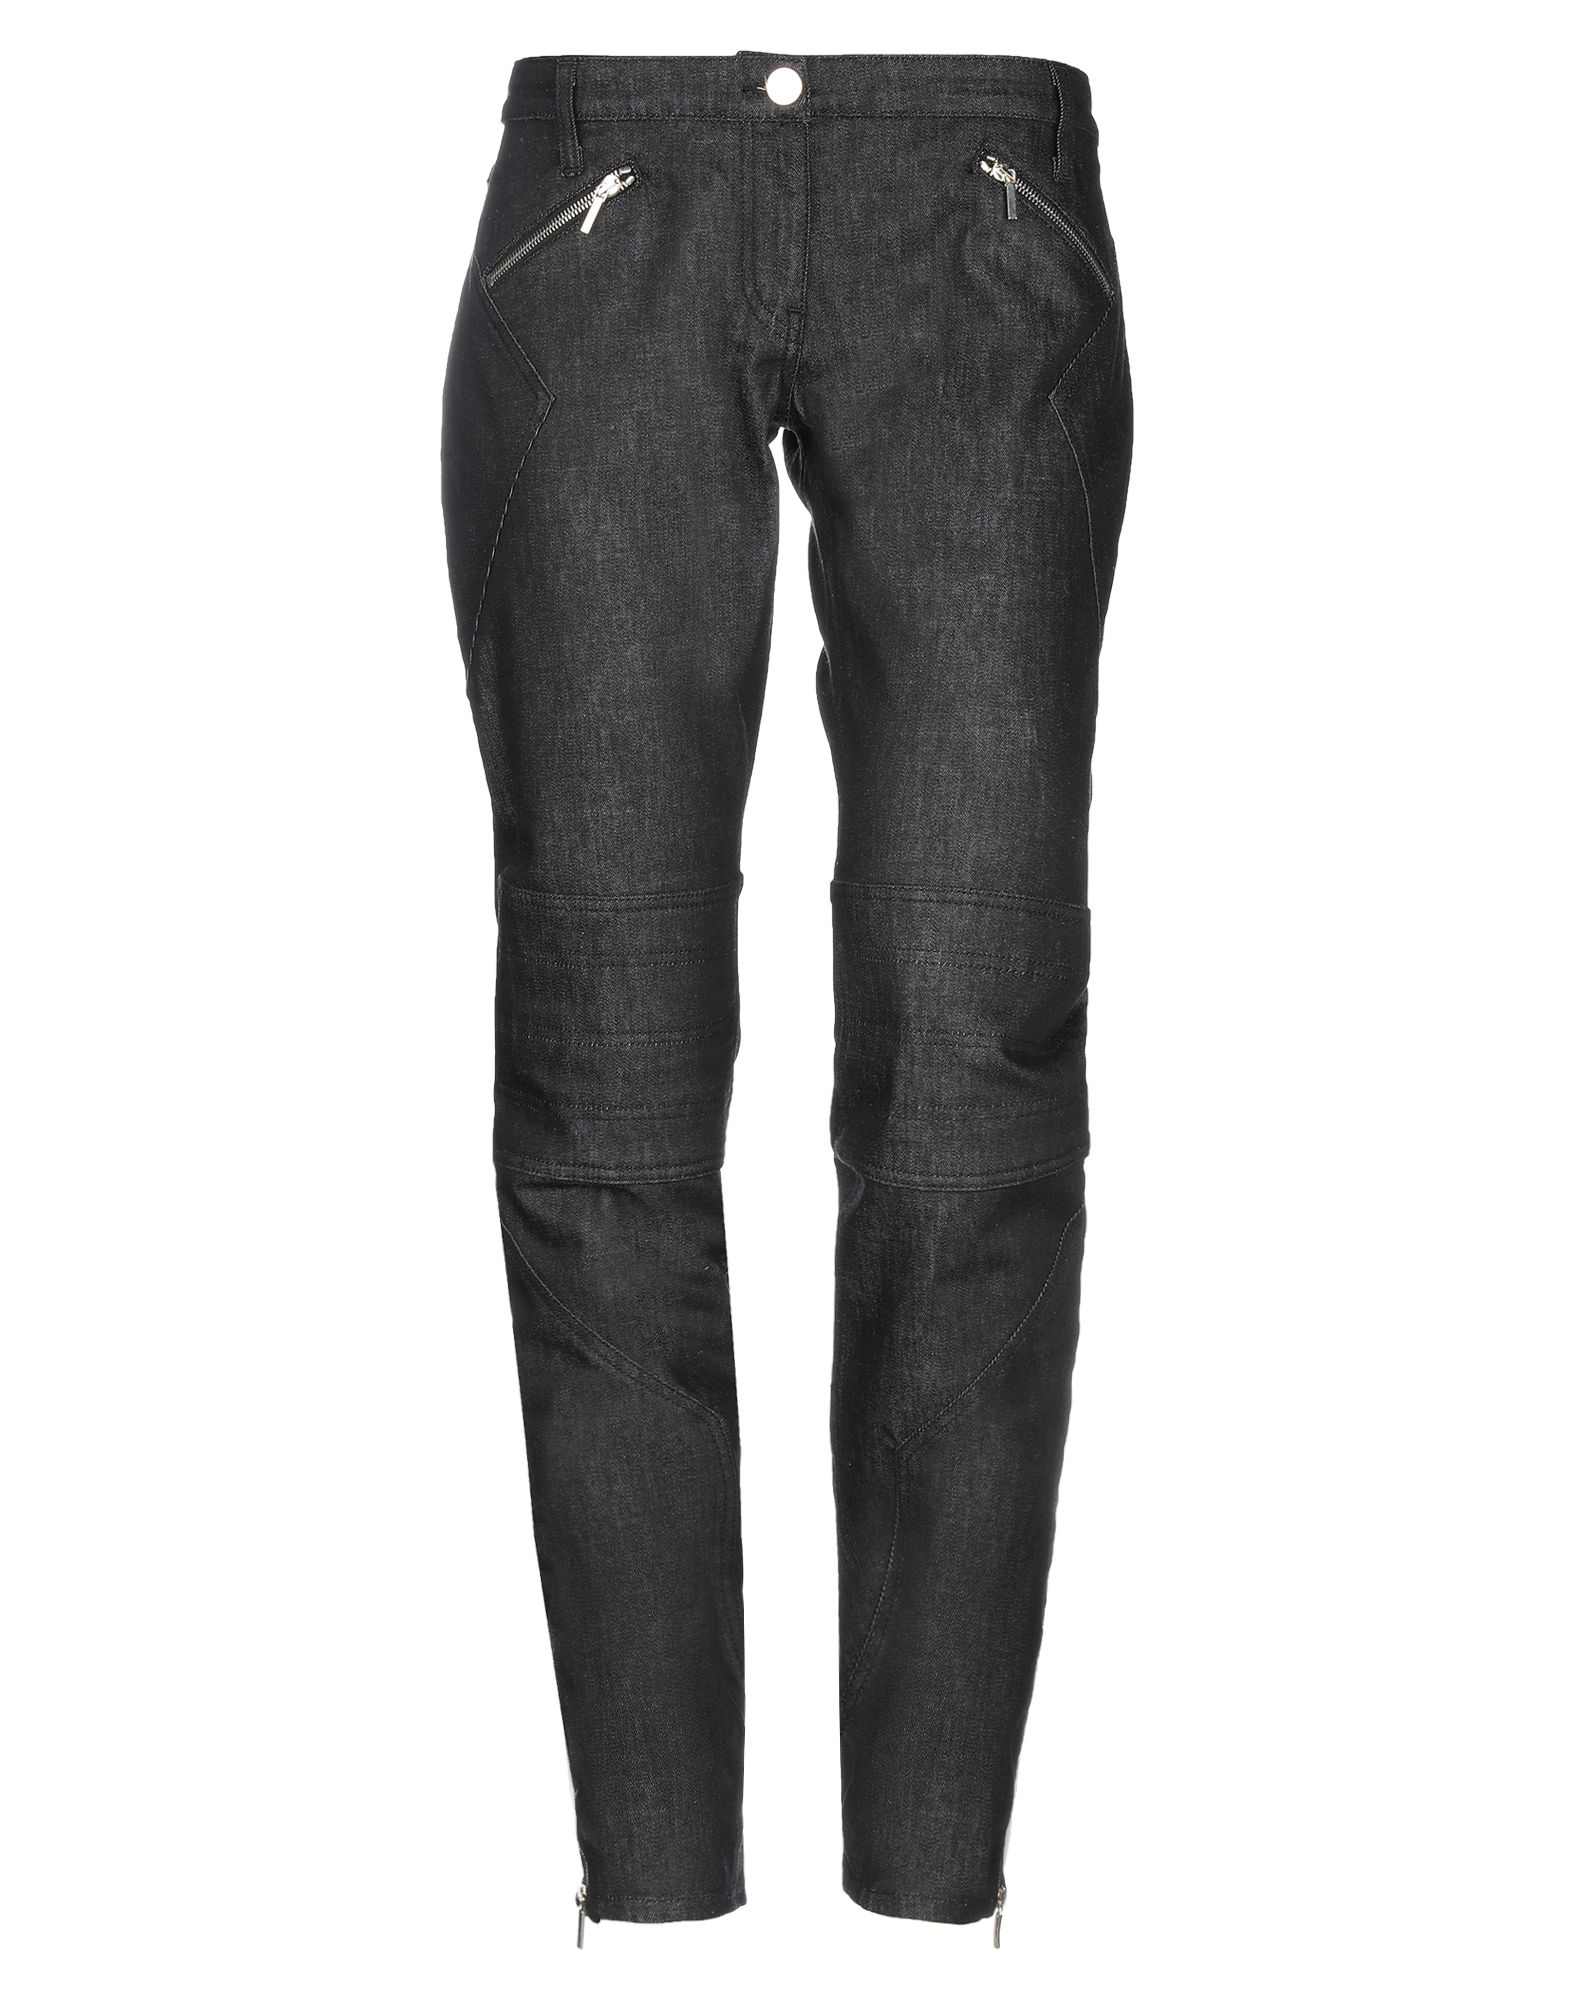 ELISABETTA FRANCHI JEANS for CELYN B. Джинсовые брюки все цены